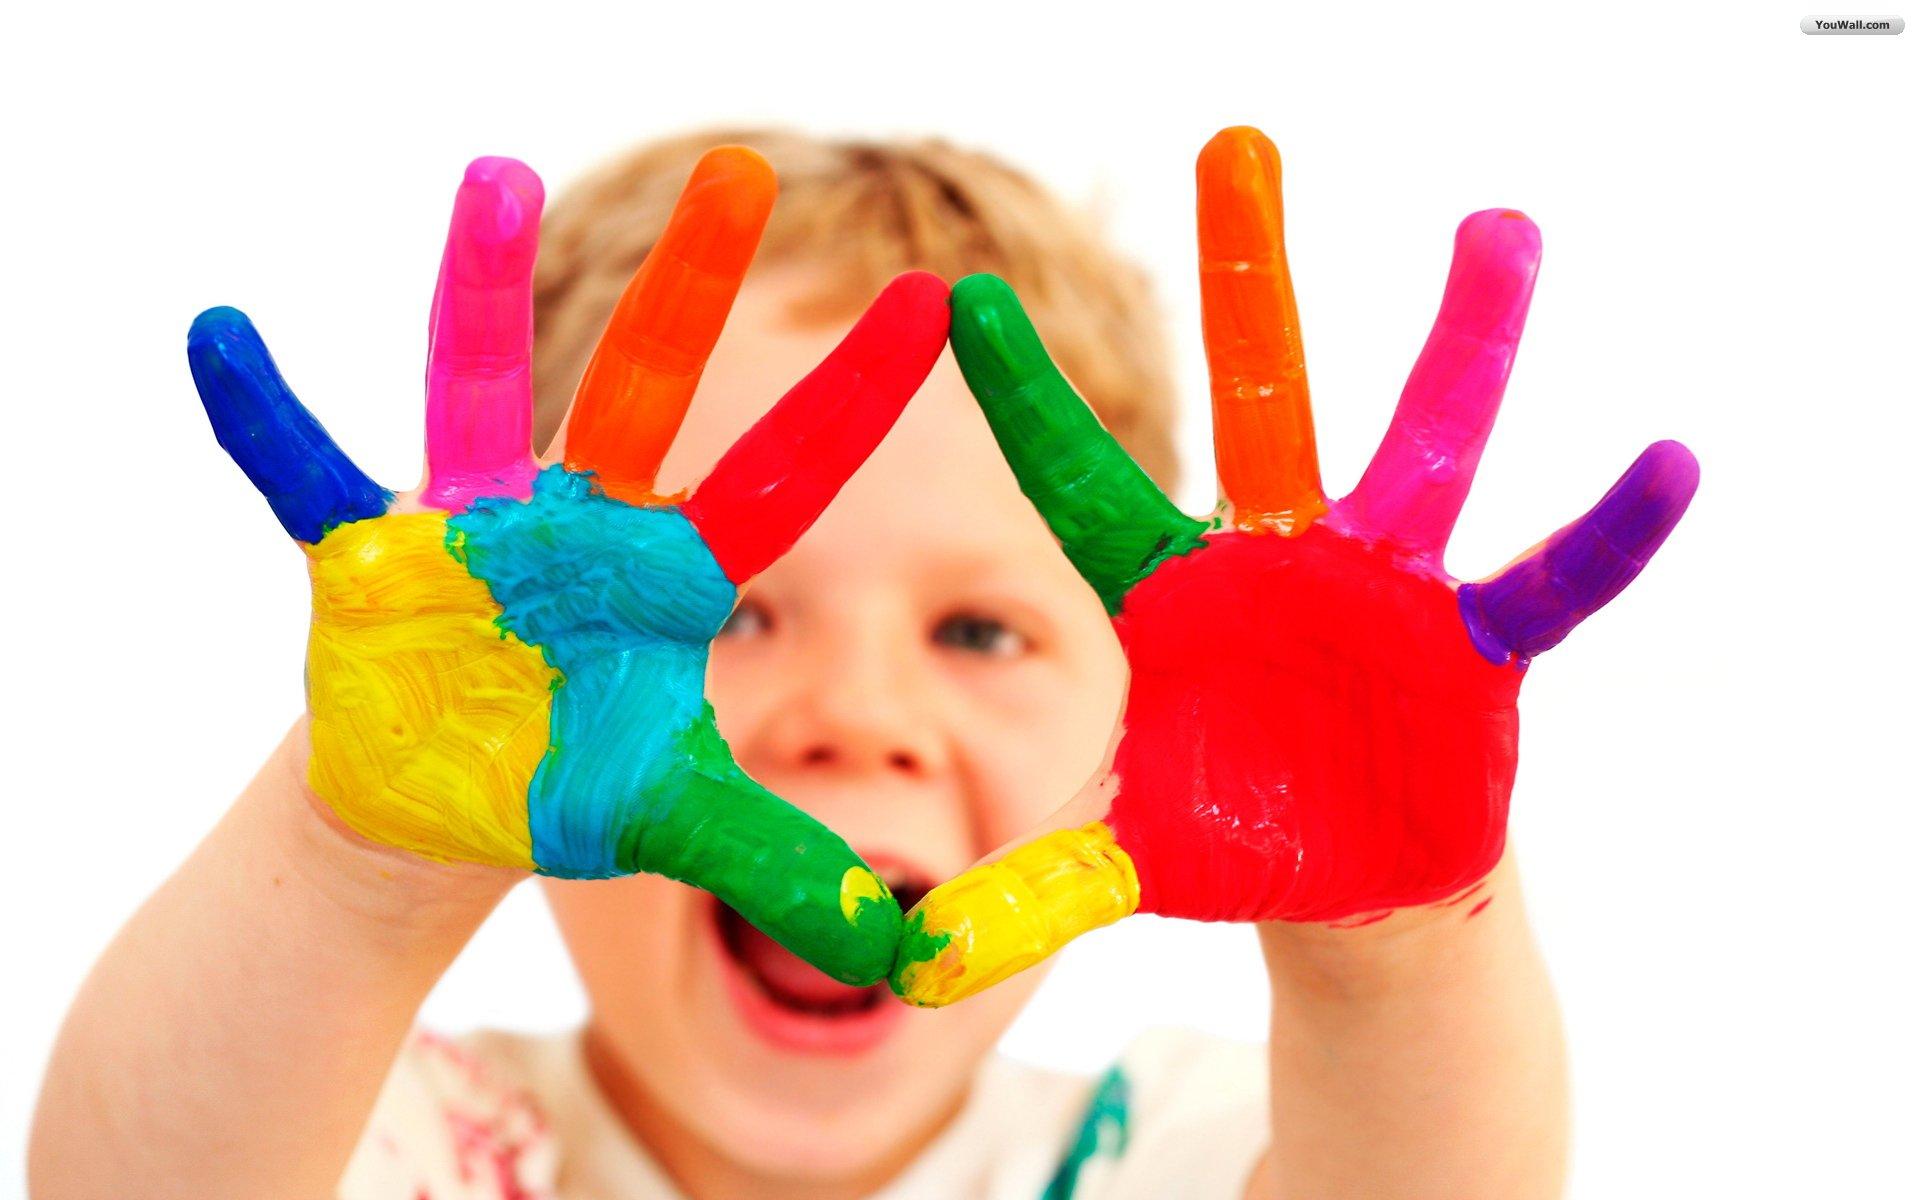 sunday school - Children Images Free